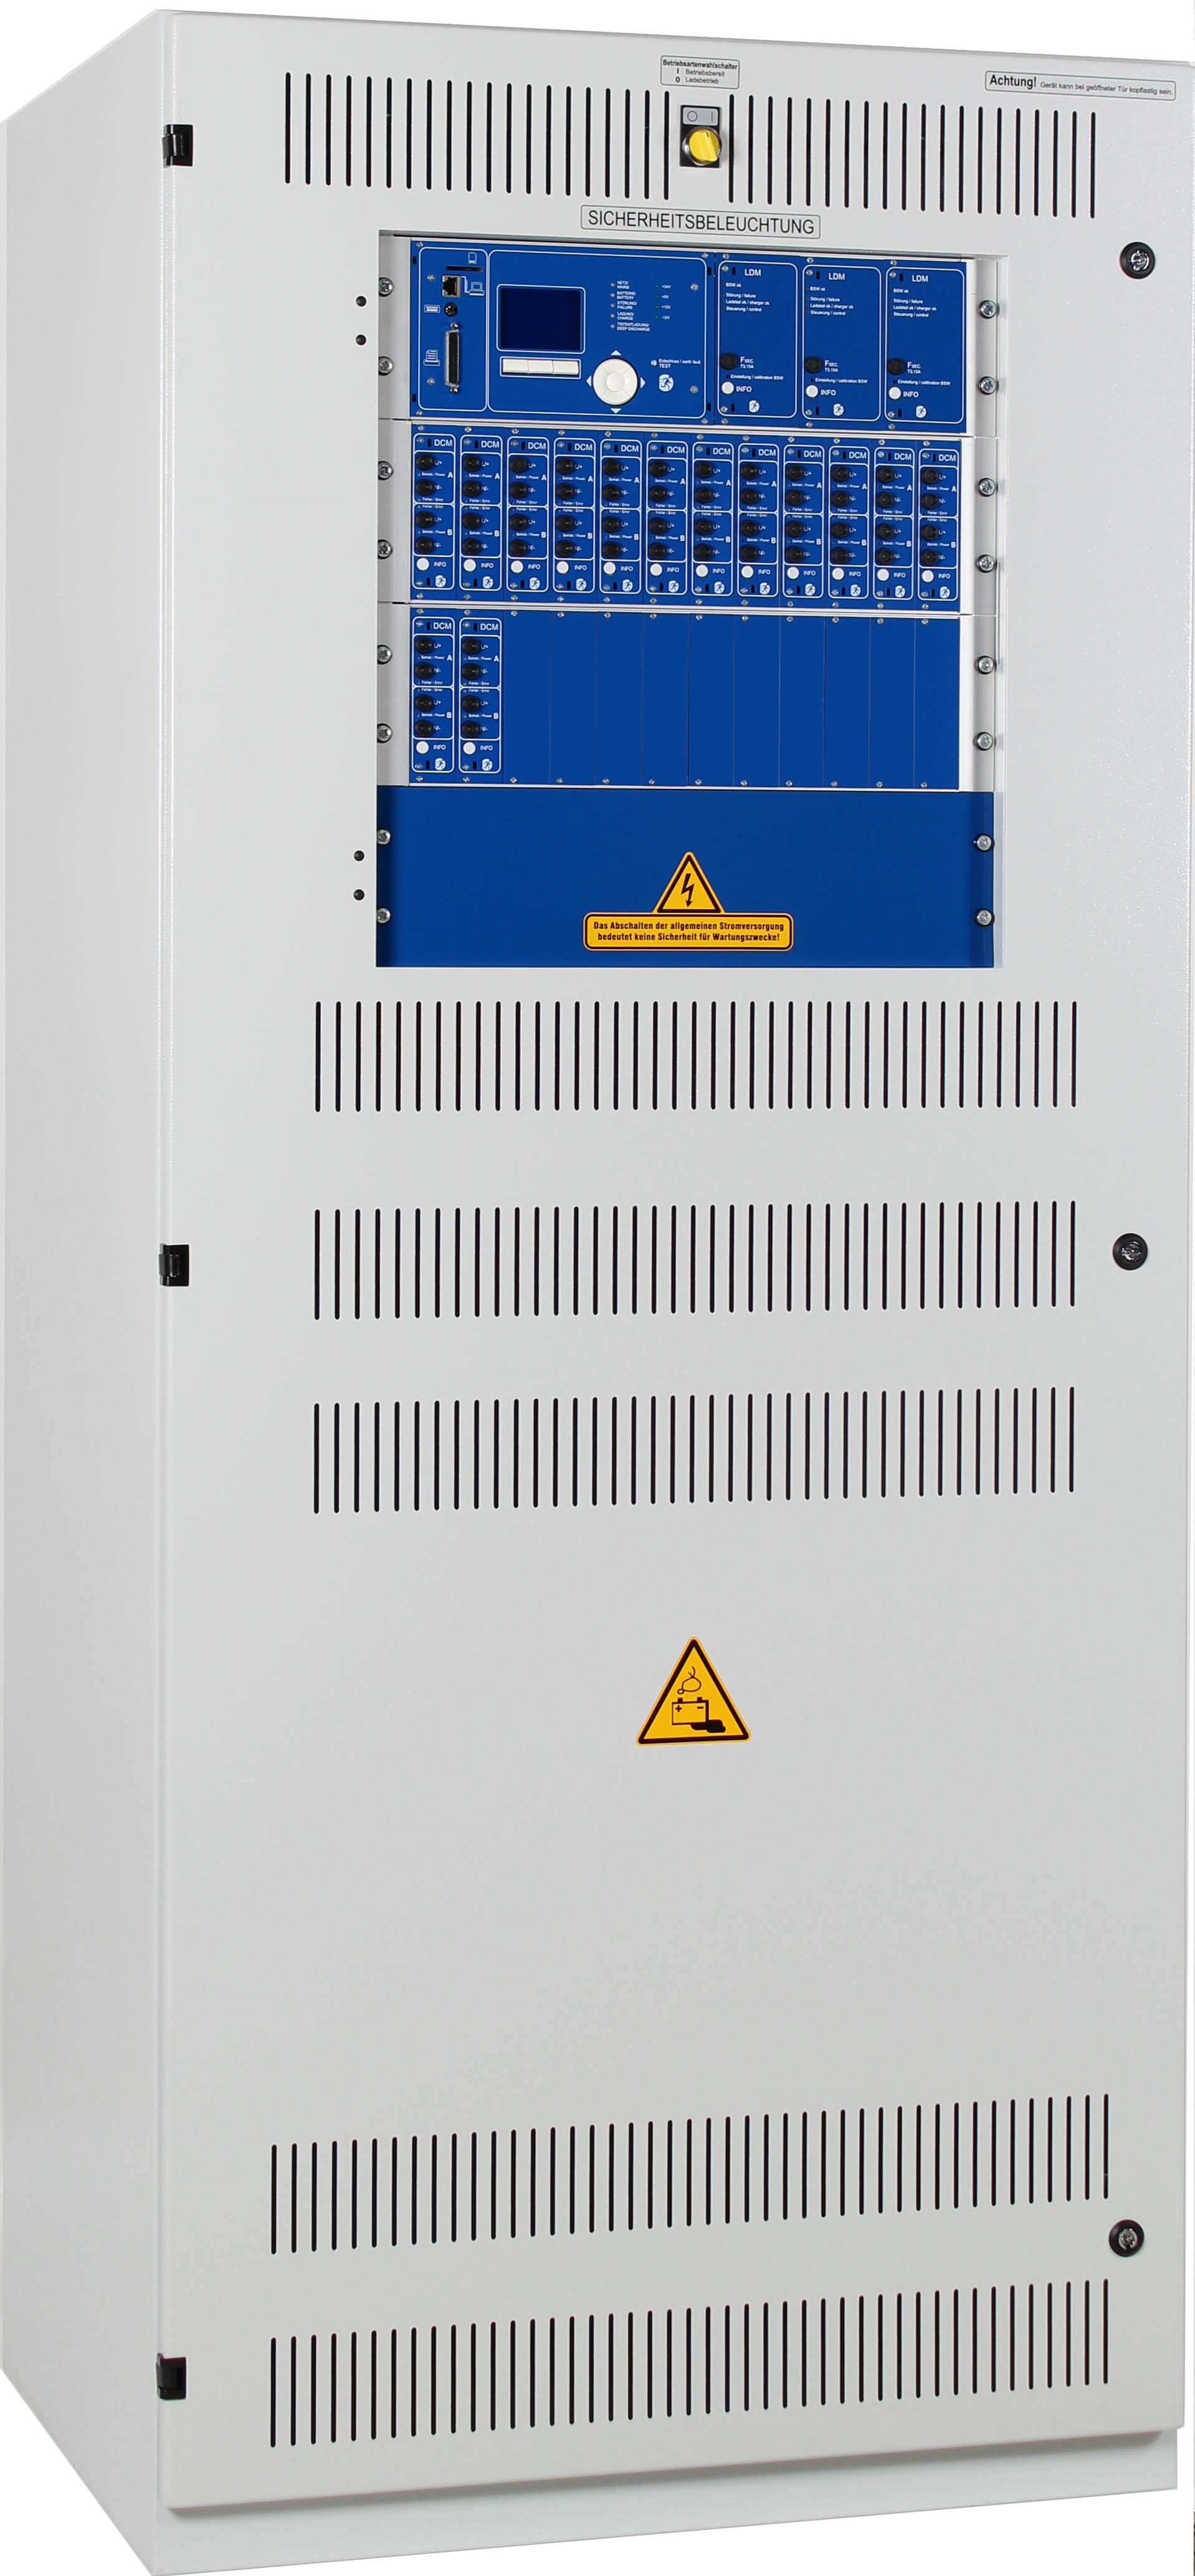 1 Stk Zentralbatterieanlage MaxiControl 24/5A, ohne DCM NLMCX224--